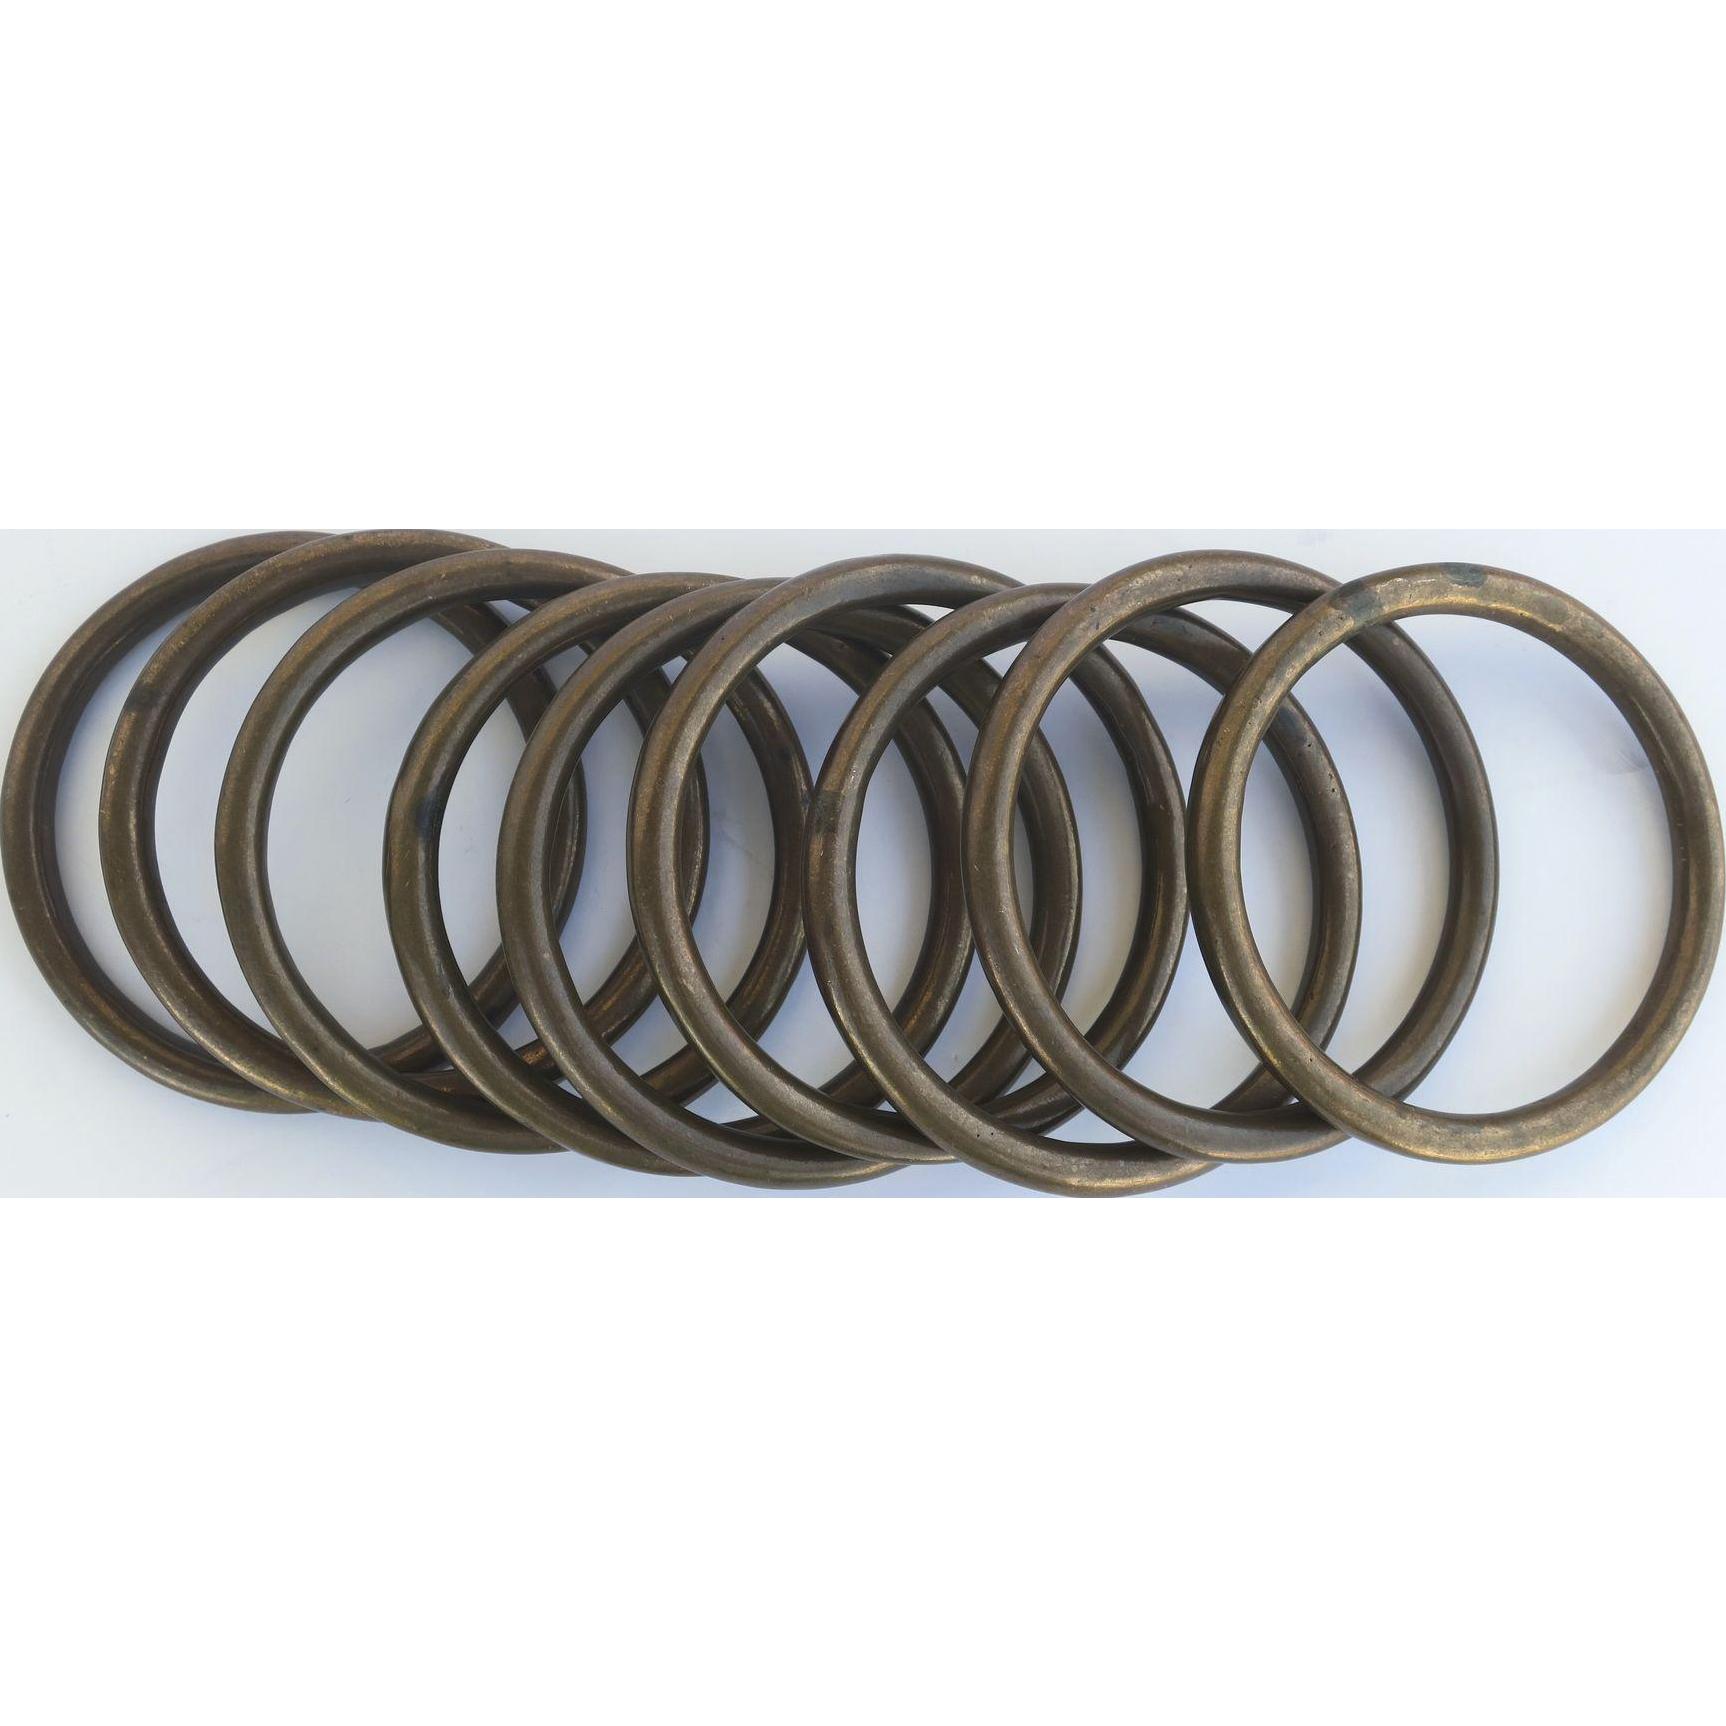 19th Century Set of Nine Large Bronze Rings